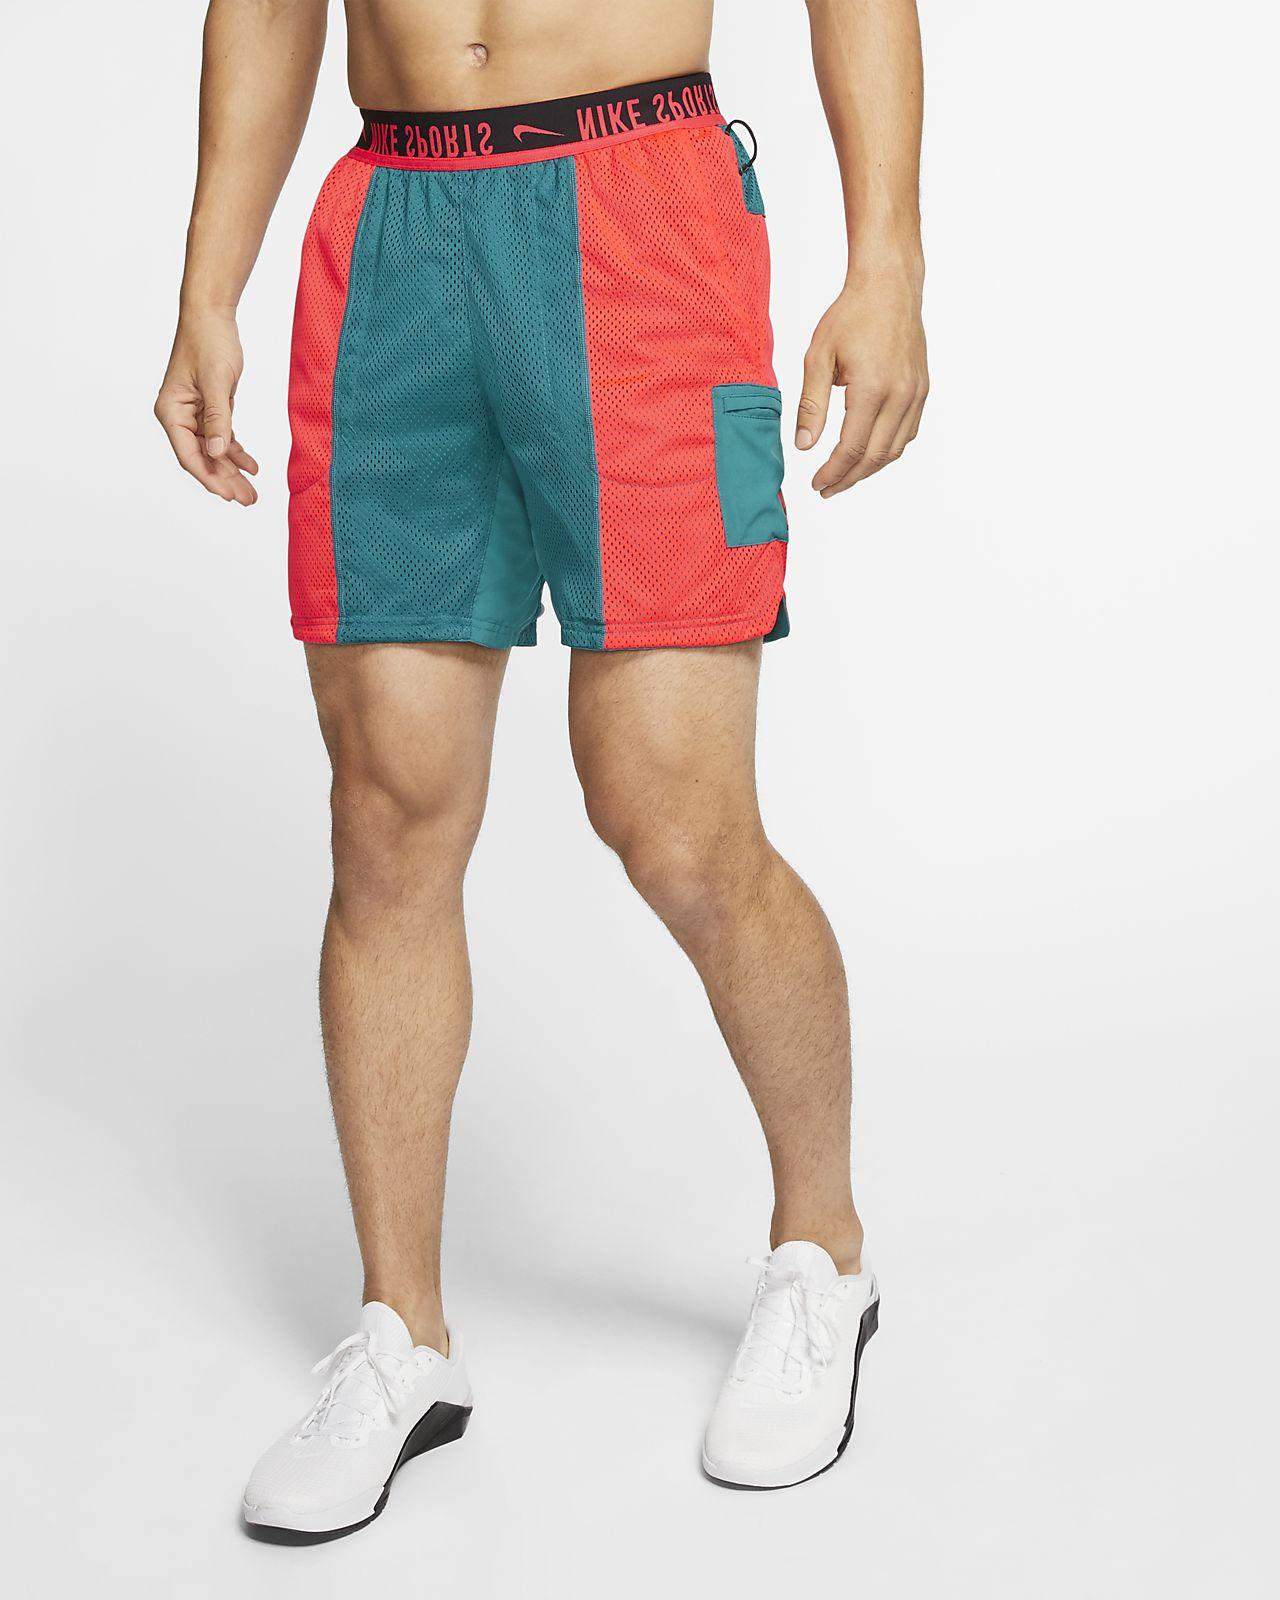 Nike Men's Reversible Training Shorts